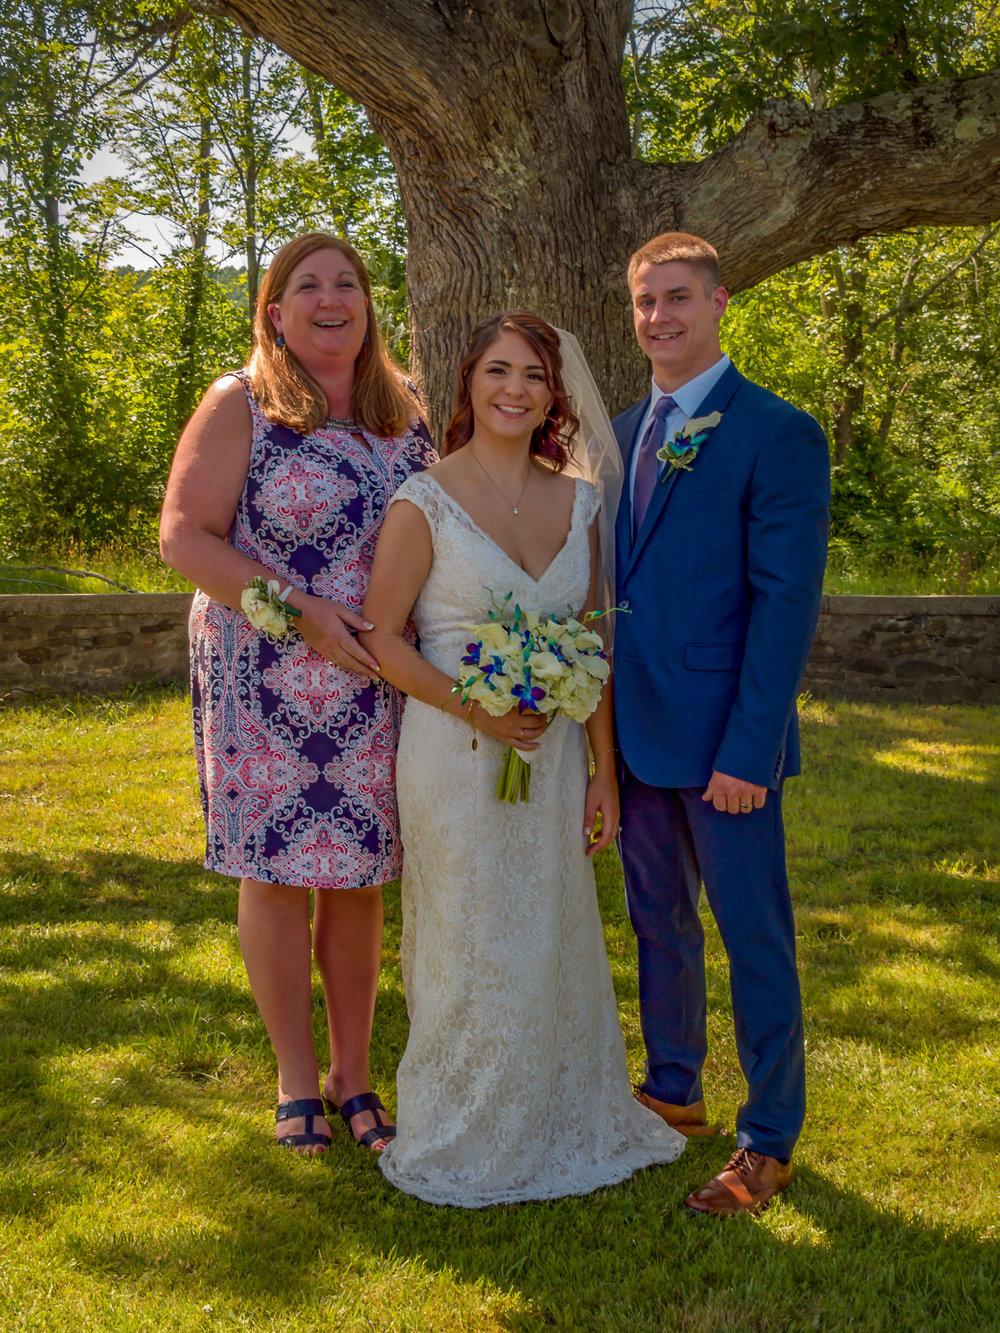 2 - Haines Family - 20180616 - MLouis-6168486.jpg